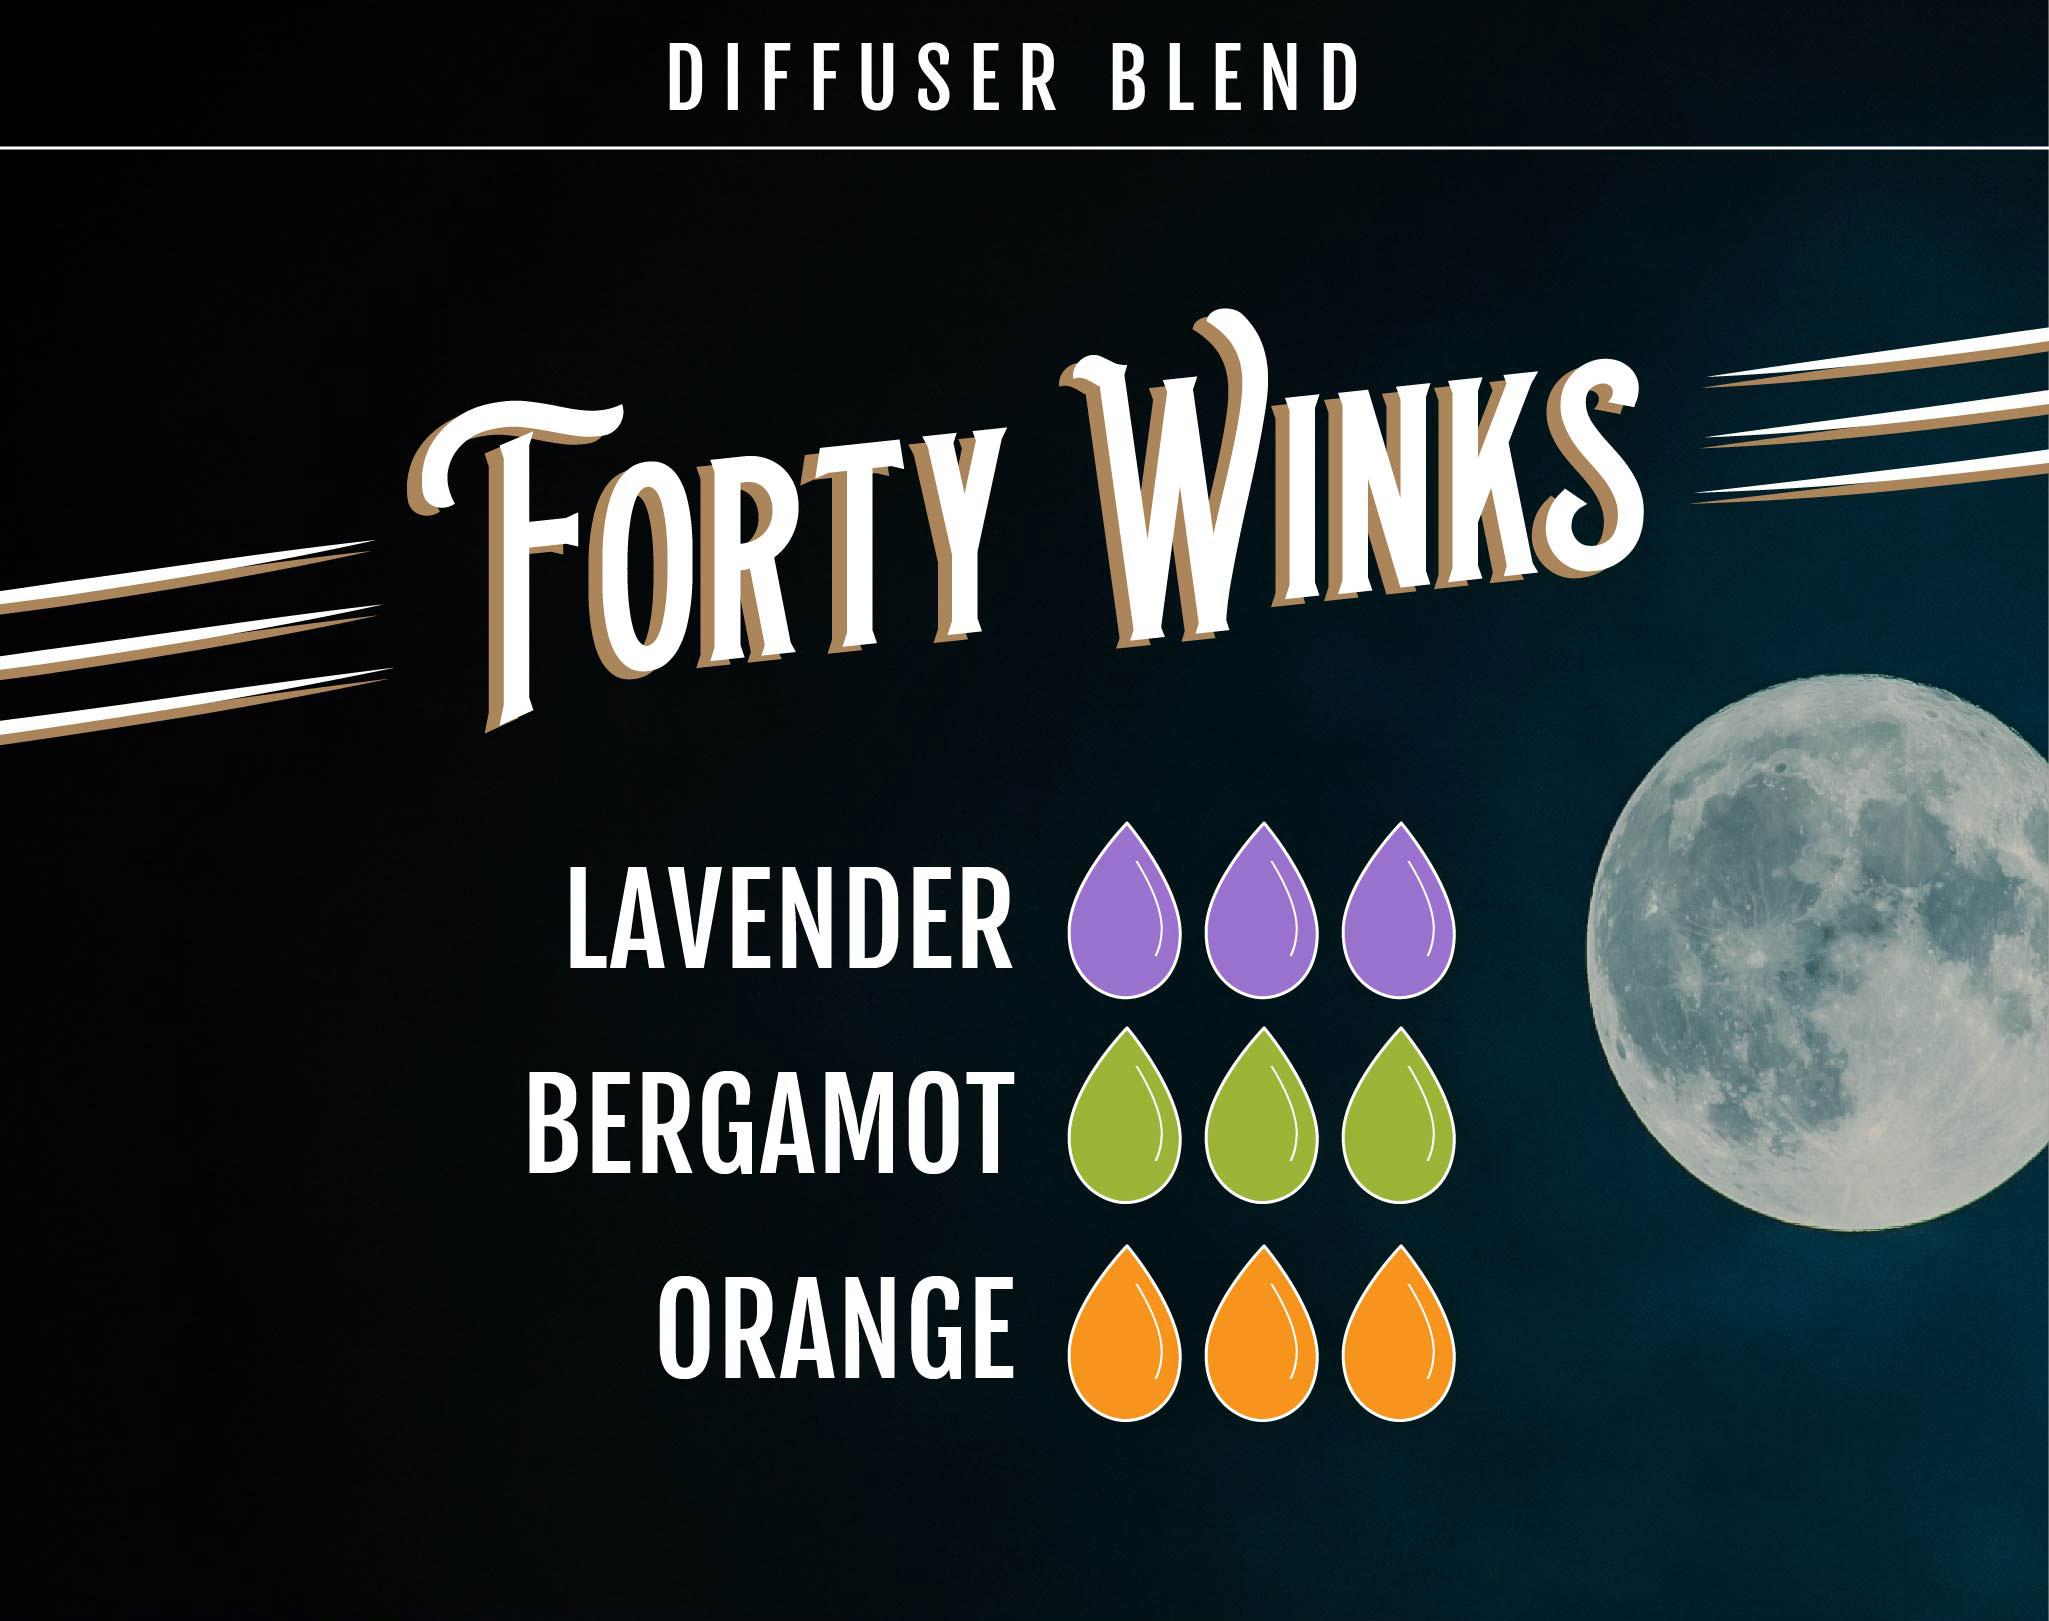 Lavender Essential Oil Diffuser Blend - Forty Winks - 3 drops Lavender, 3 drops Bergamot, 3 drops Orange